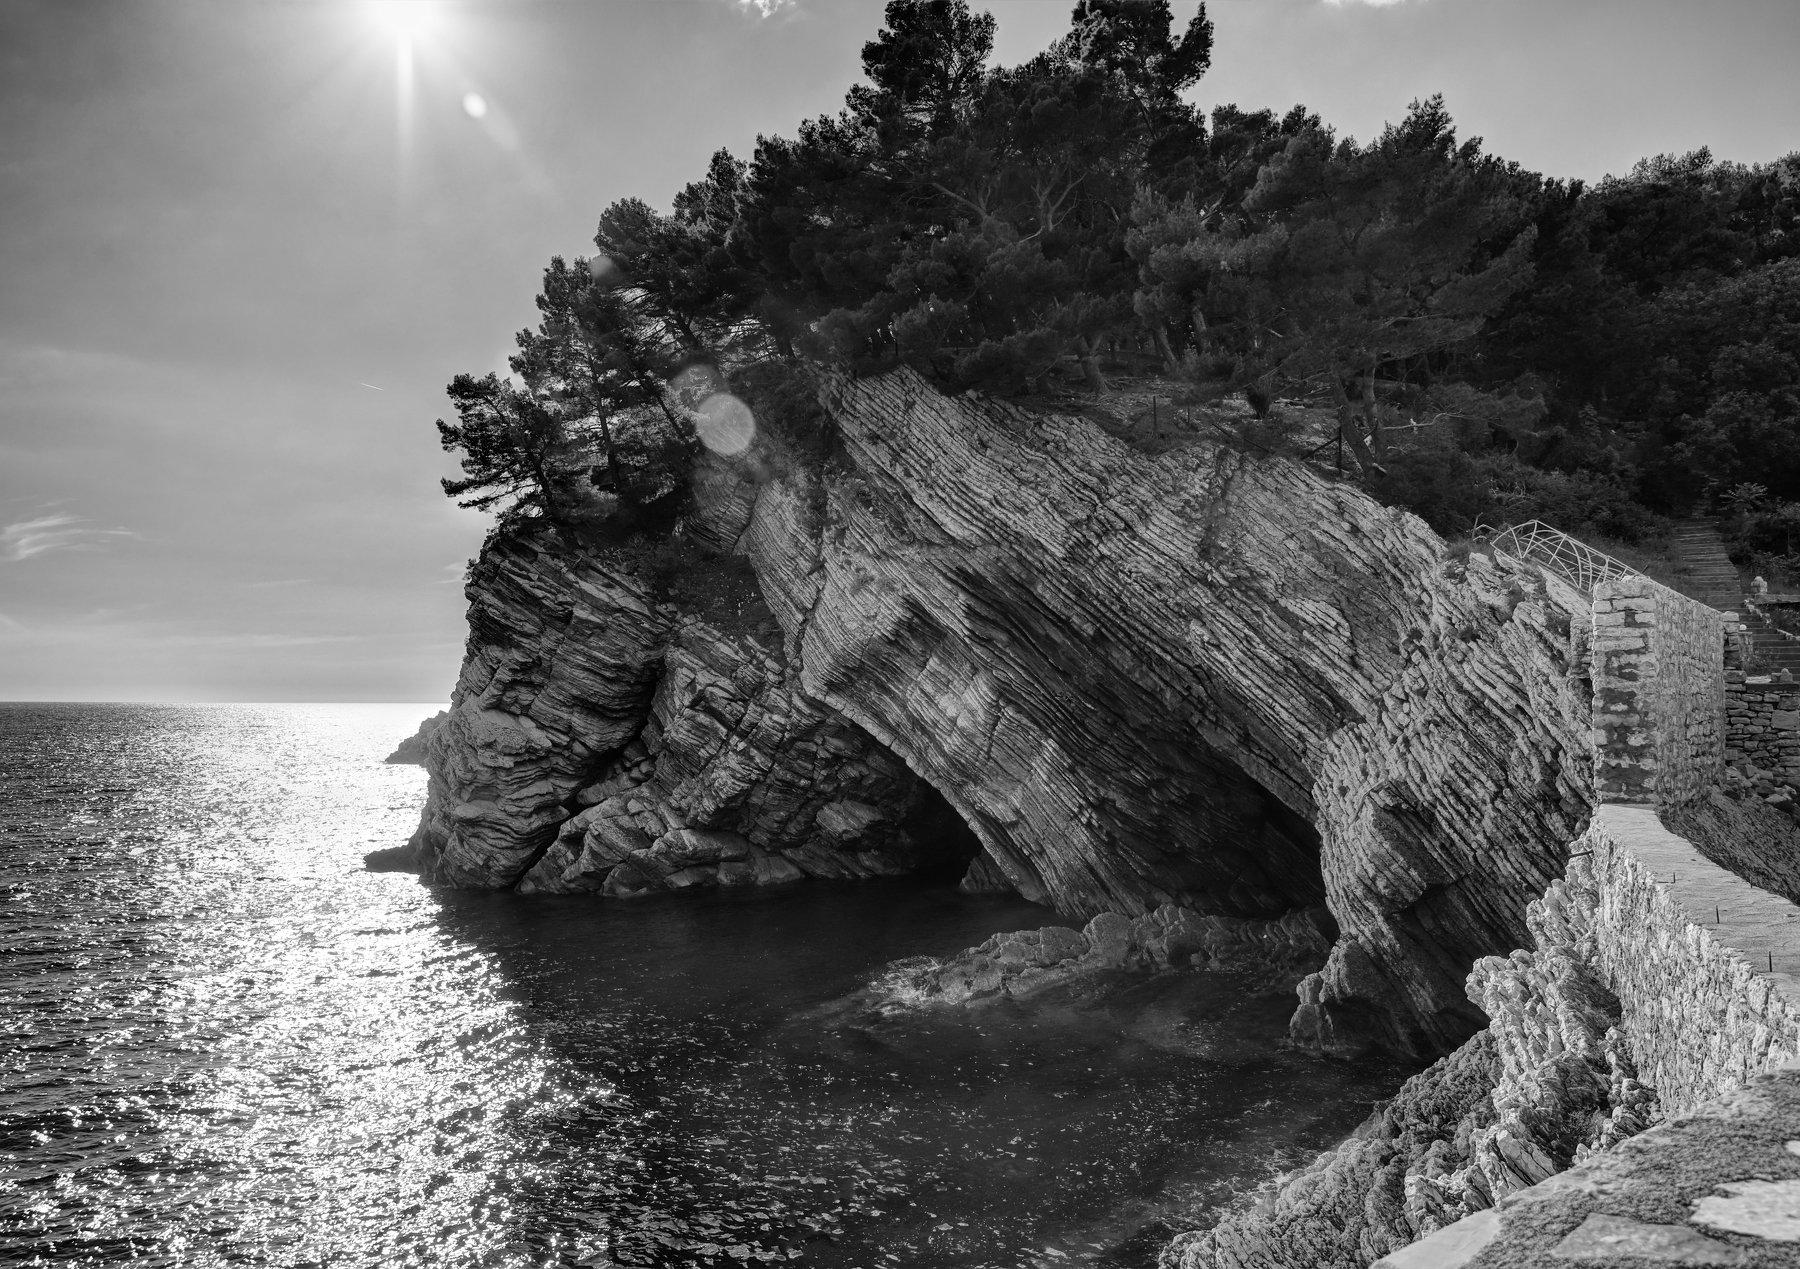 скала, море,  пейзаж, природа, ч/б, солнце, Георгий Муравьёв